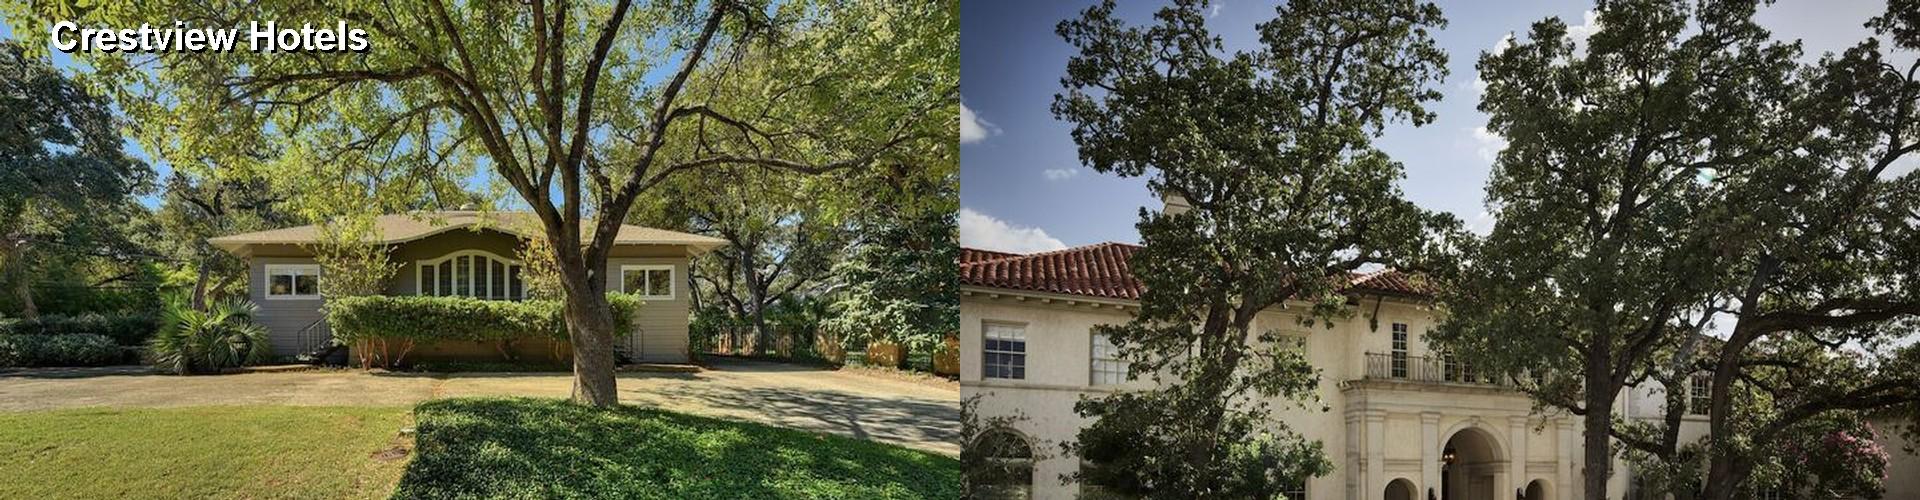 5 Best Hotels Near Crestview